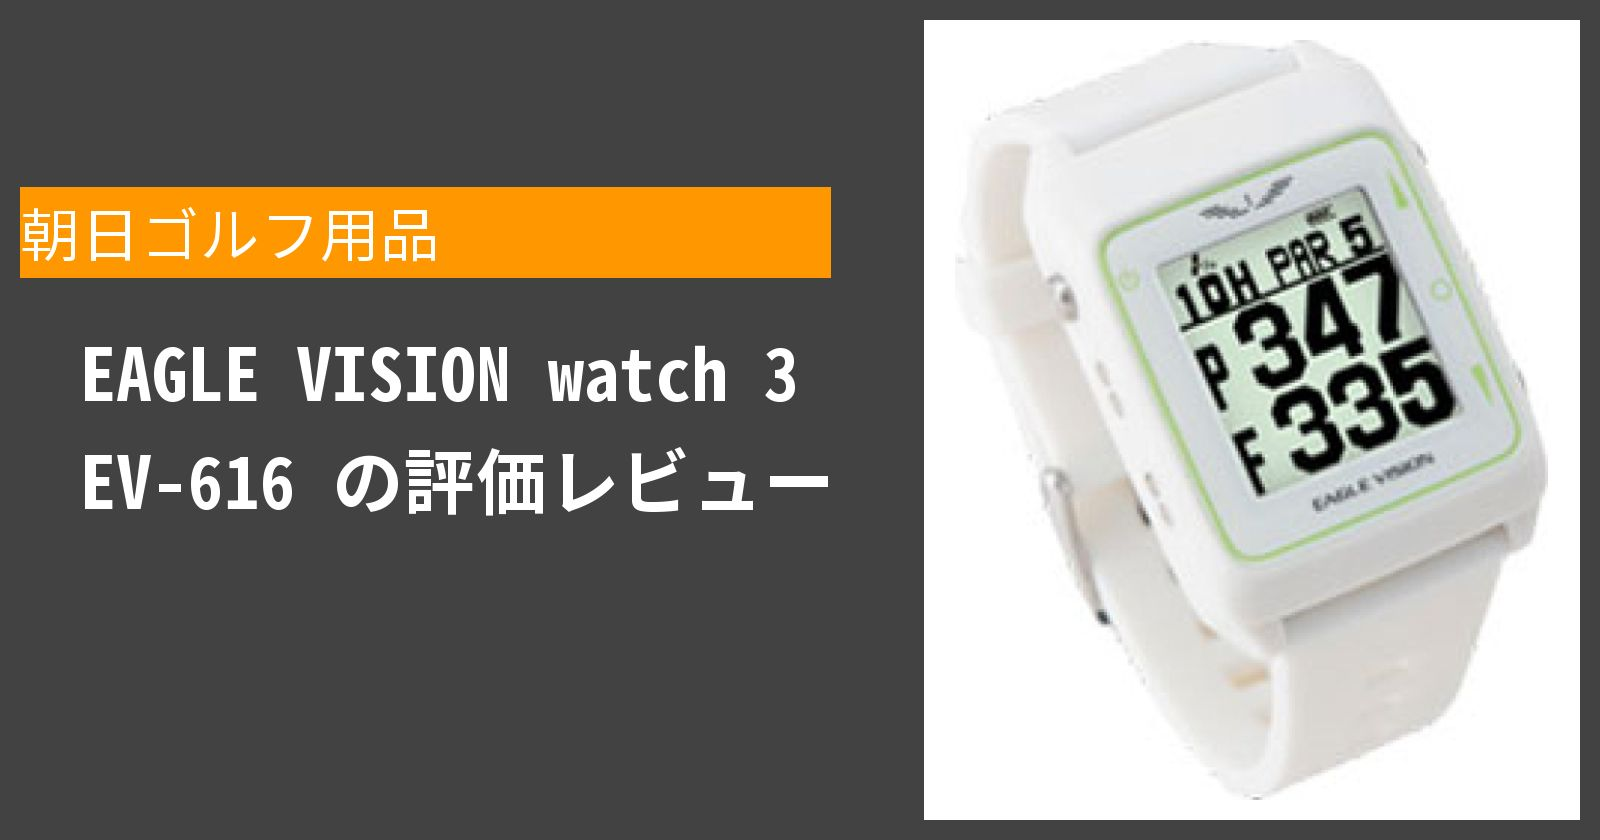 EAGLE VISION watch 3 EV-616を徹底評価